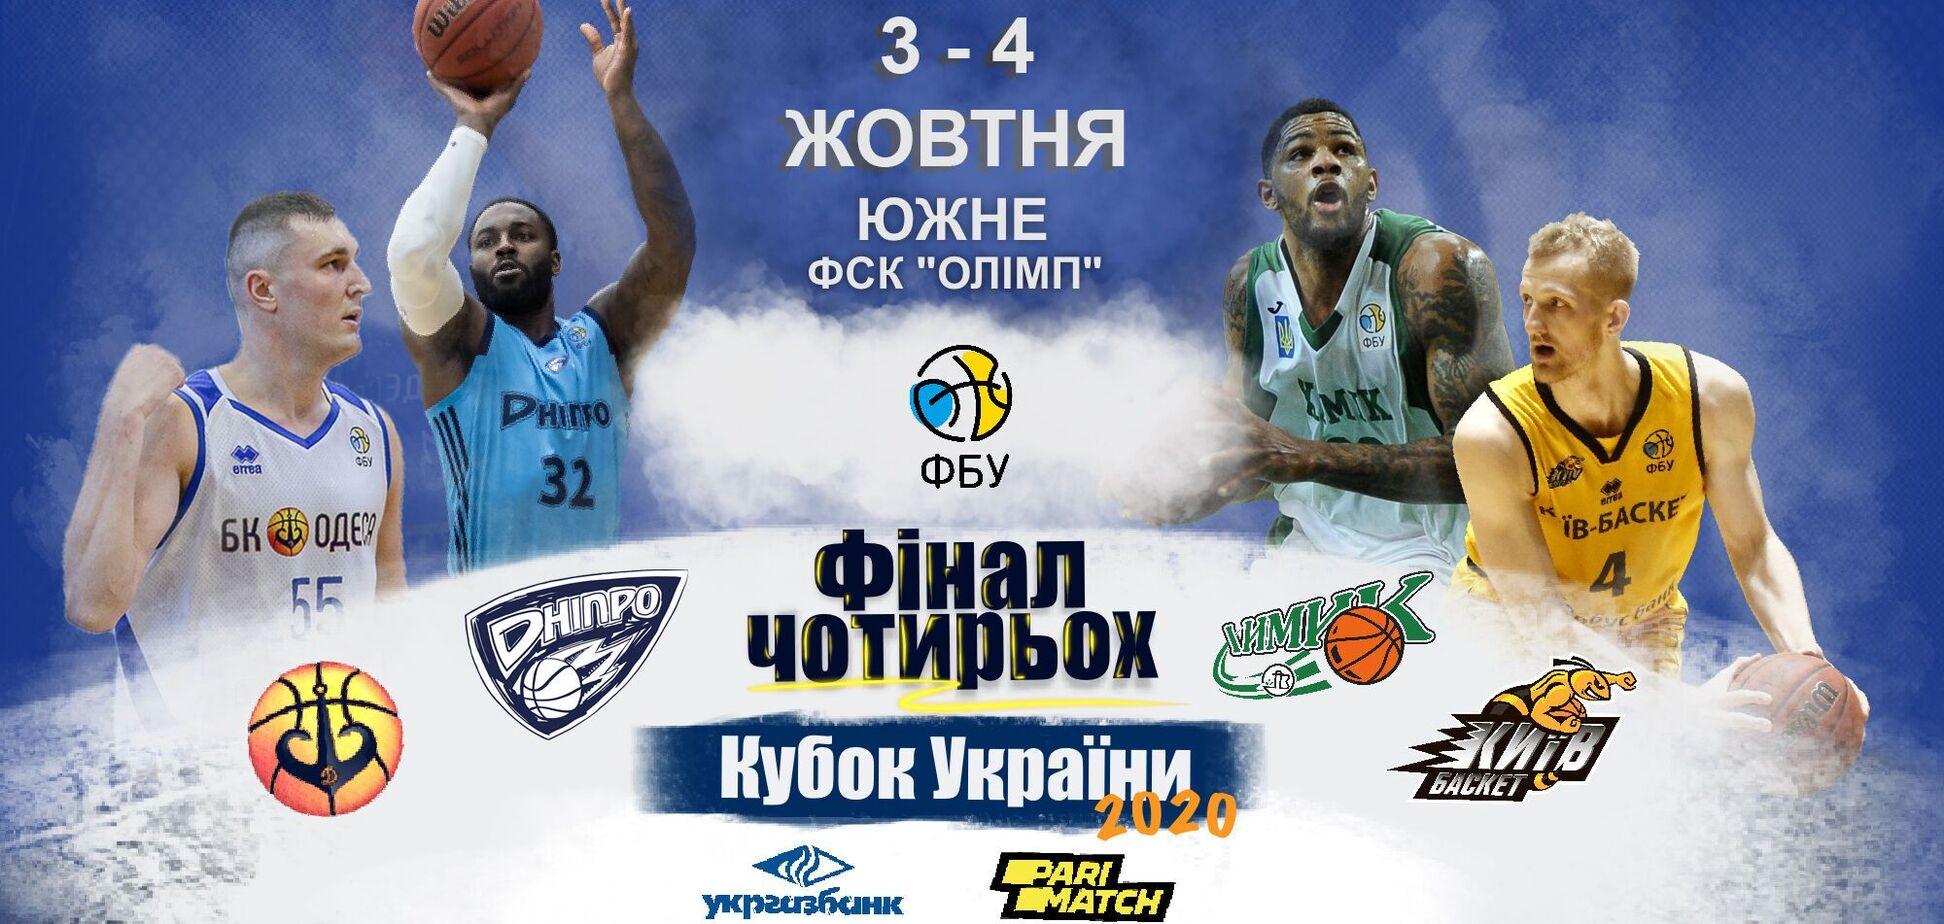 Фінал чотирьох Кубка України